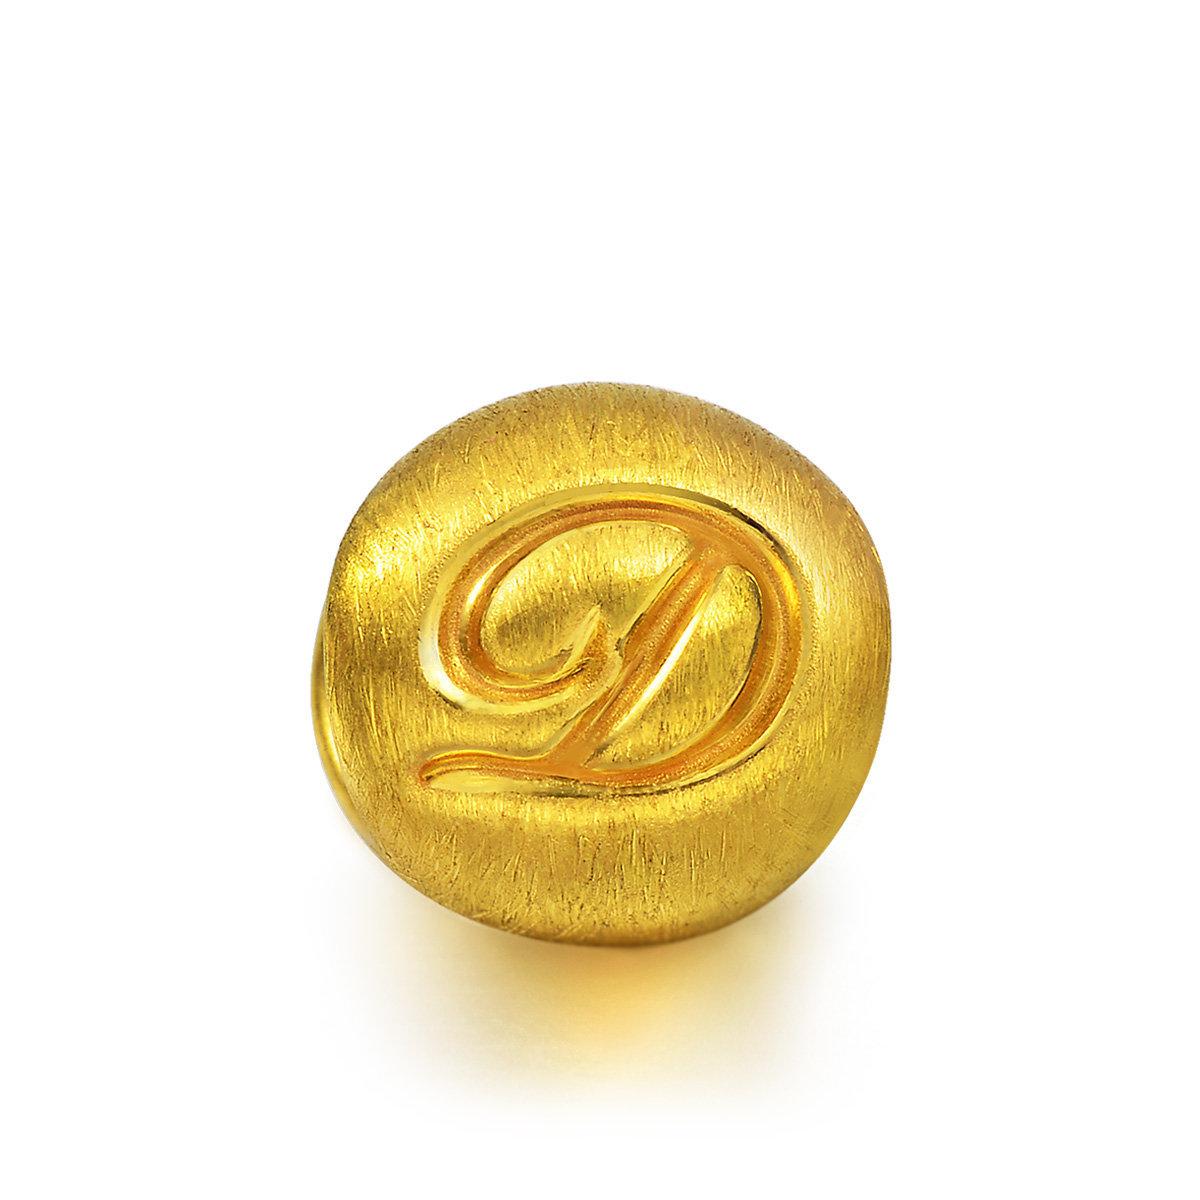 Charme 'Alphabets' 999 Gold Letter D Charm (Bracelet not included)